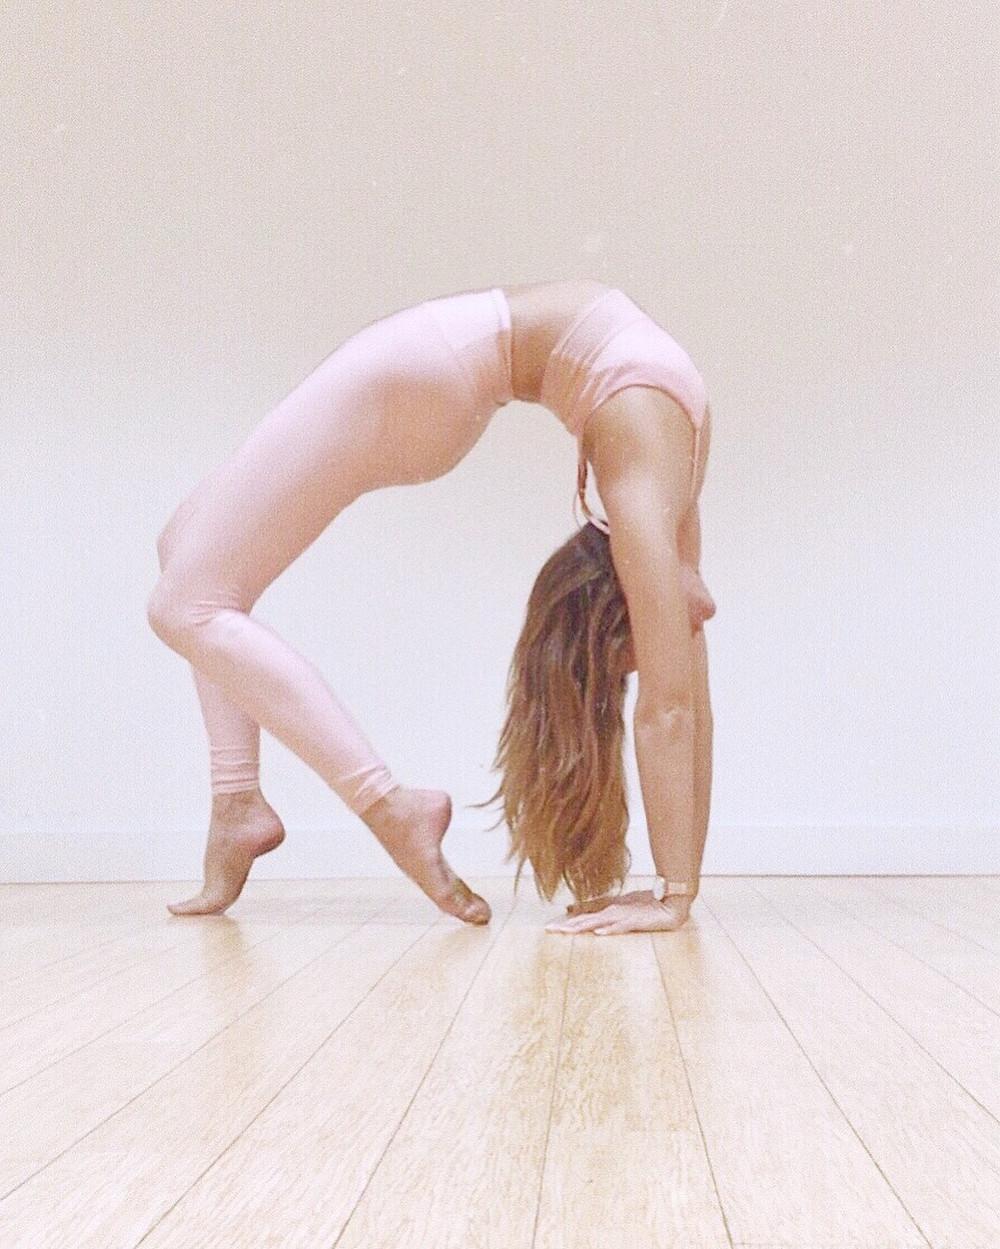 Katie Baki Yoga Instructor in backbend